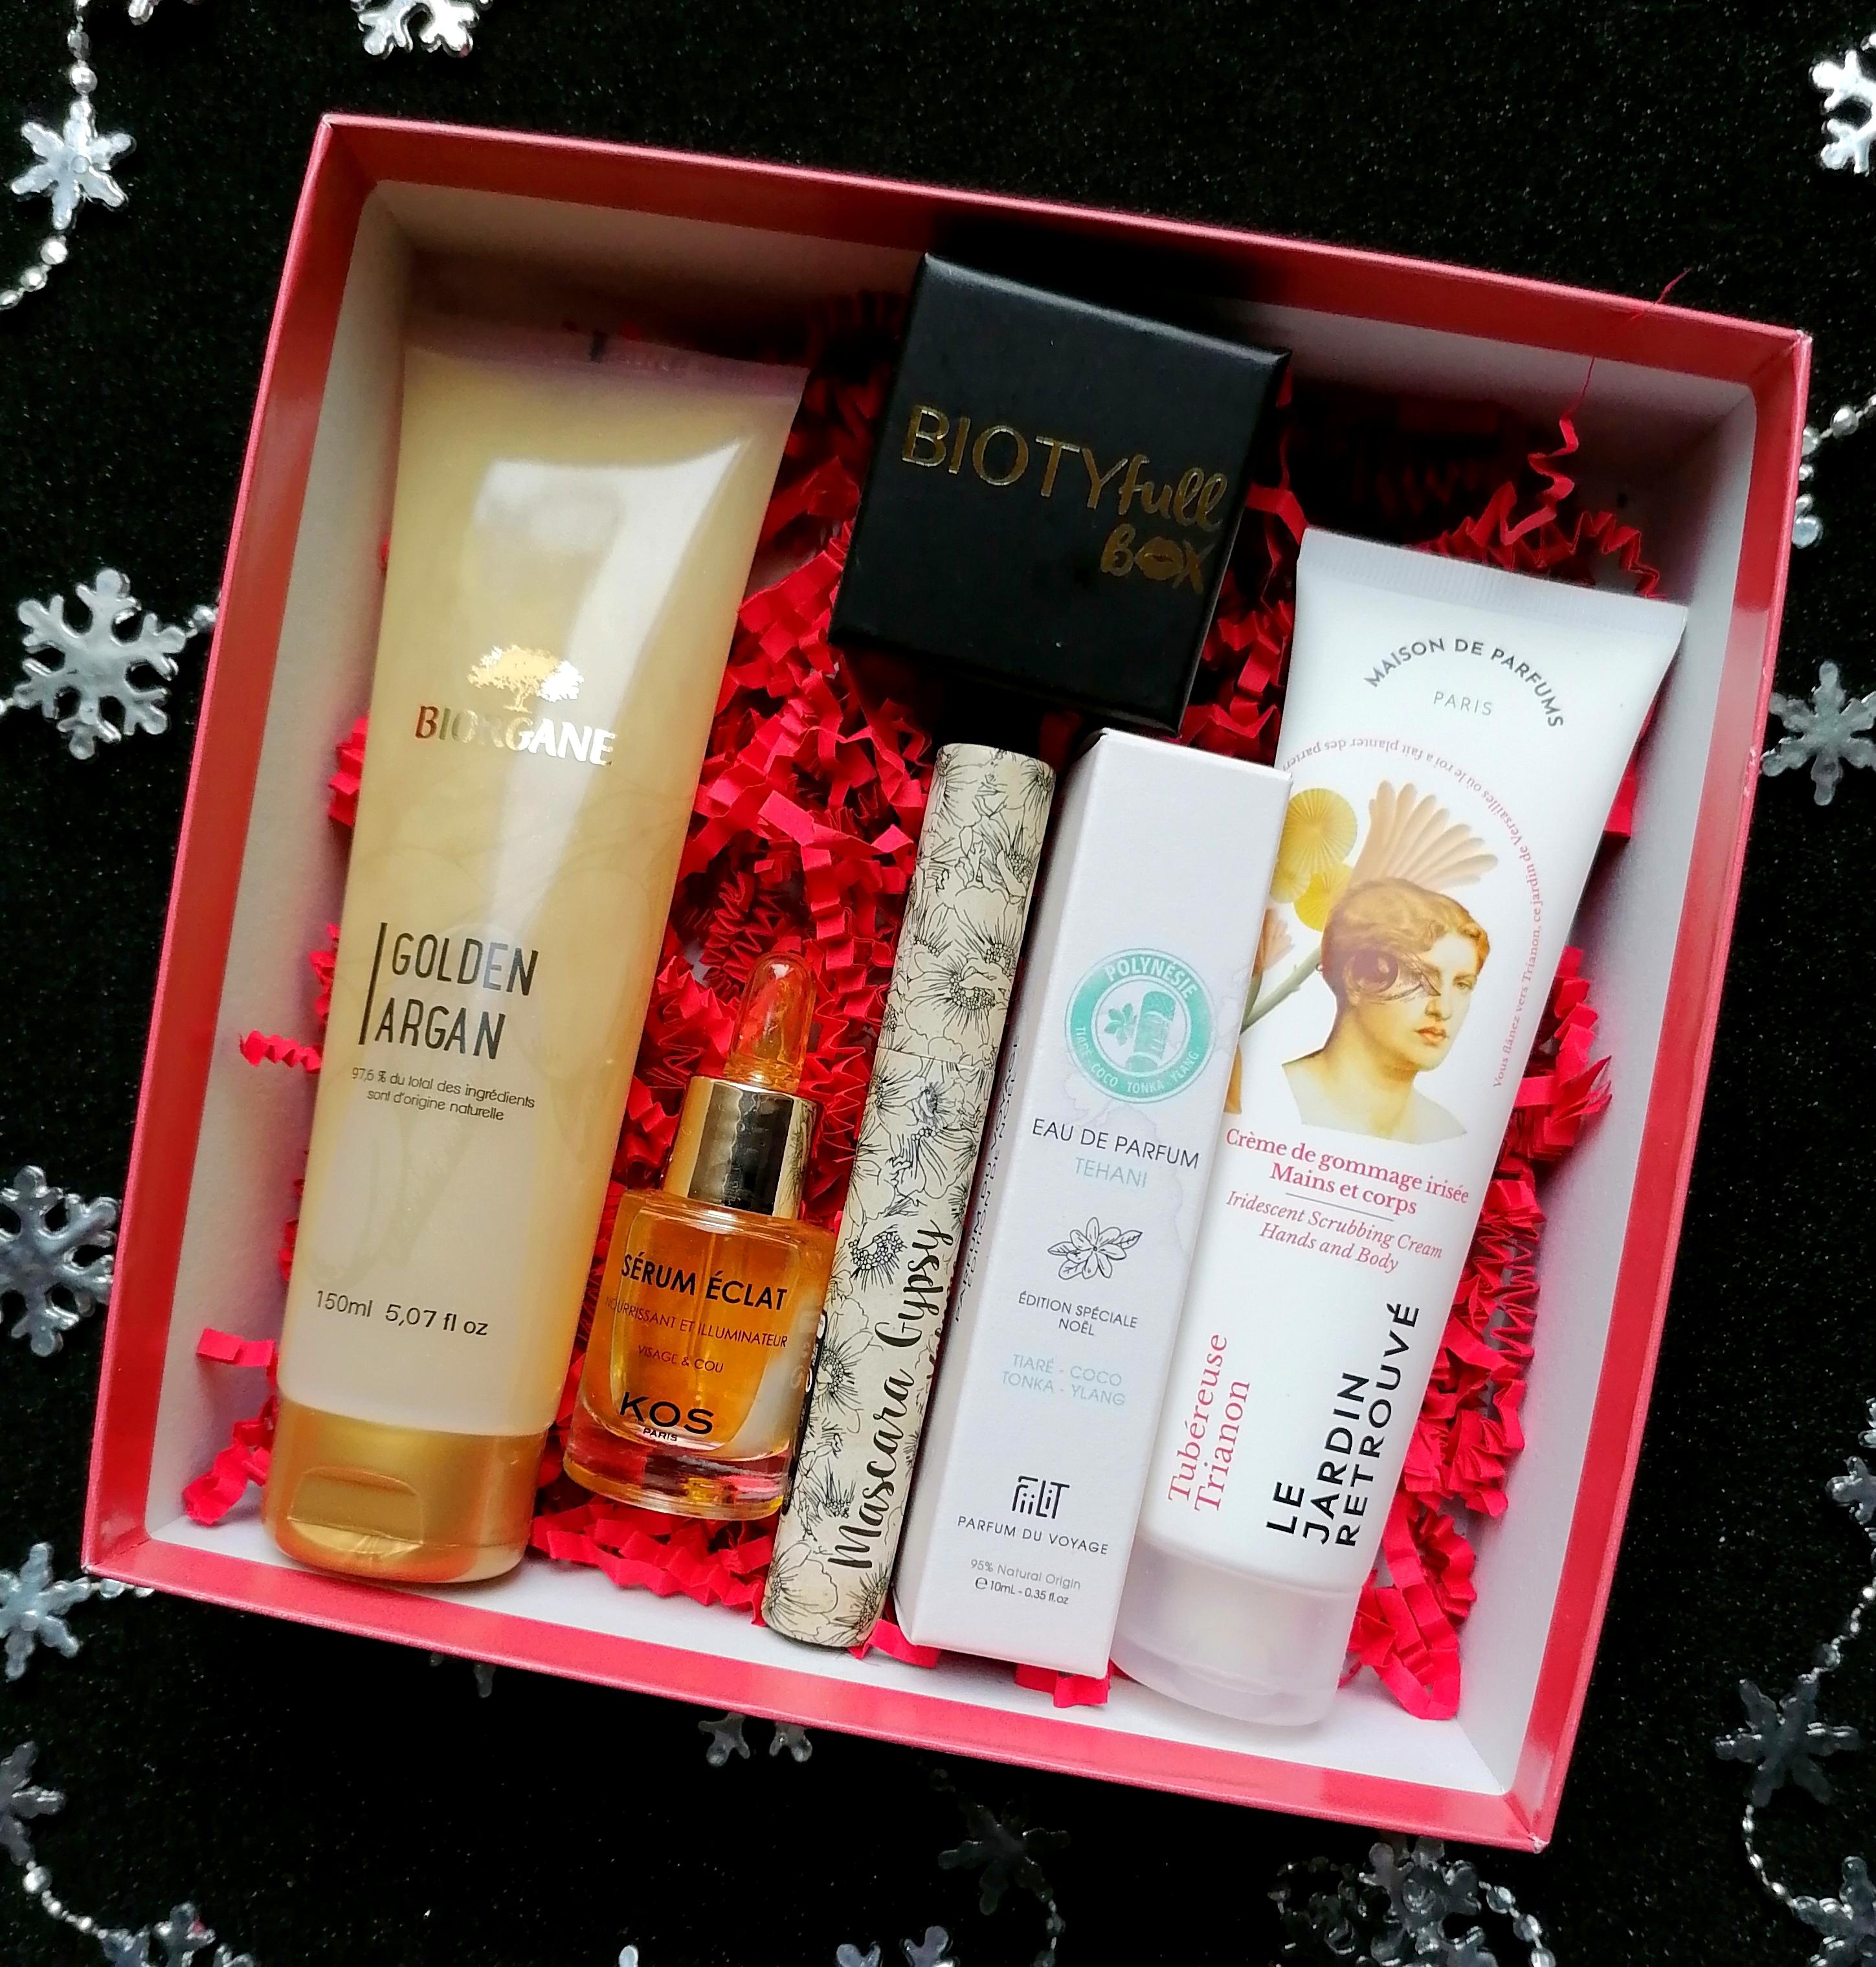 Biotyfull Box  La Précieuse de Noël 2020! ✨